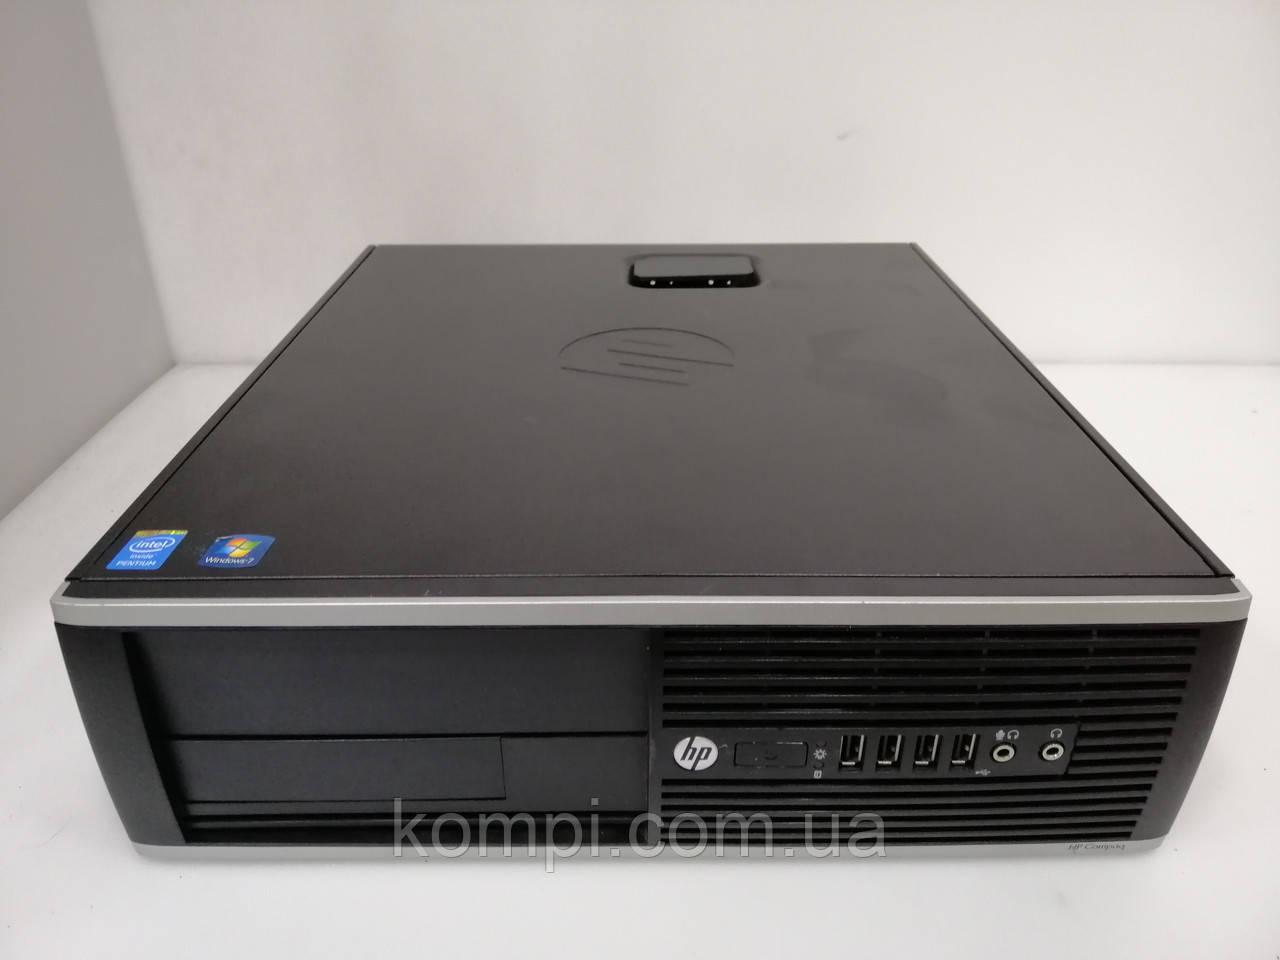 Системний блок HP Elite 6300 s1155 (Intel Pentium G2020/4Gb DDR3/Video INTG/HDD 160GB/ WIN 7)